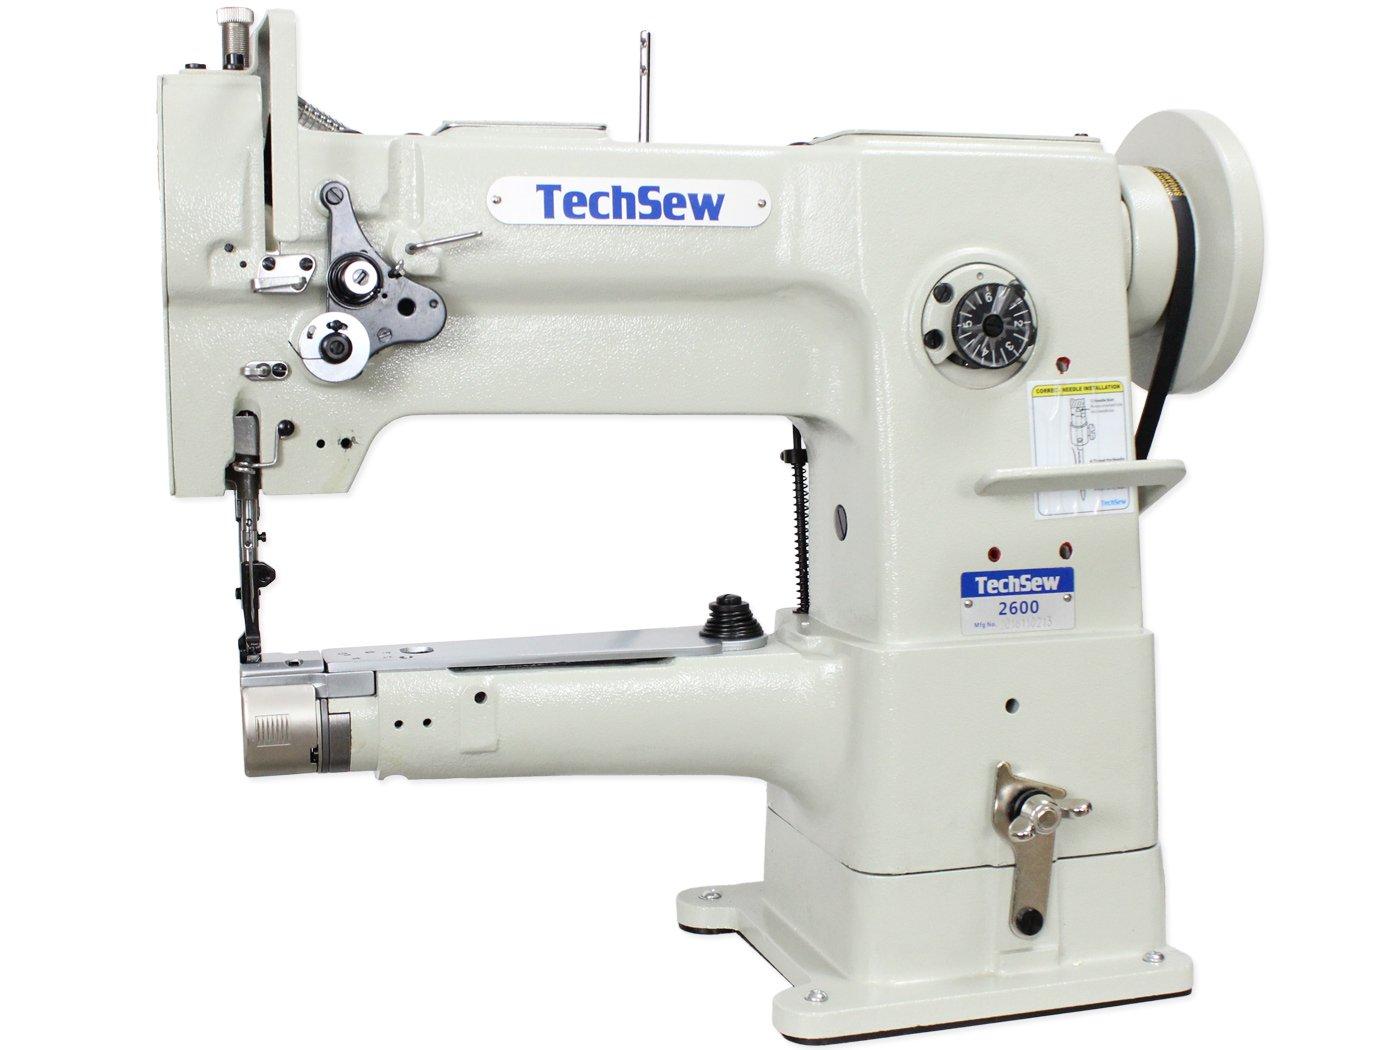 NGOSEW LAP SEAM FOLDER ARM TO BODY FLAT BED SEWING MACHINE 1//4H